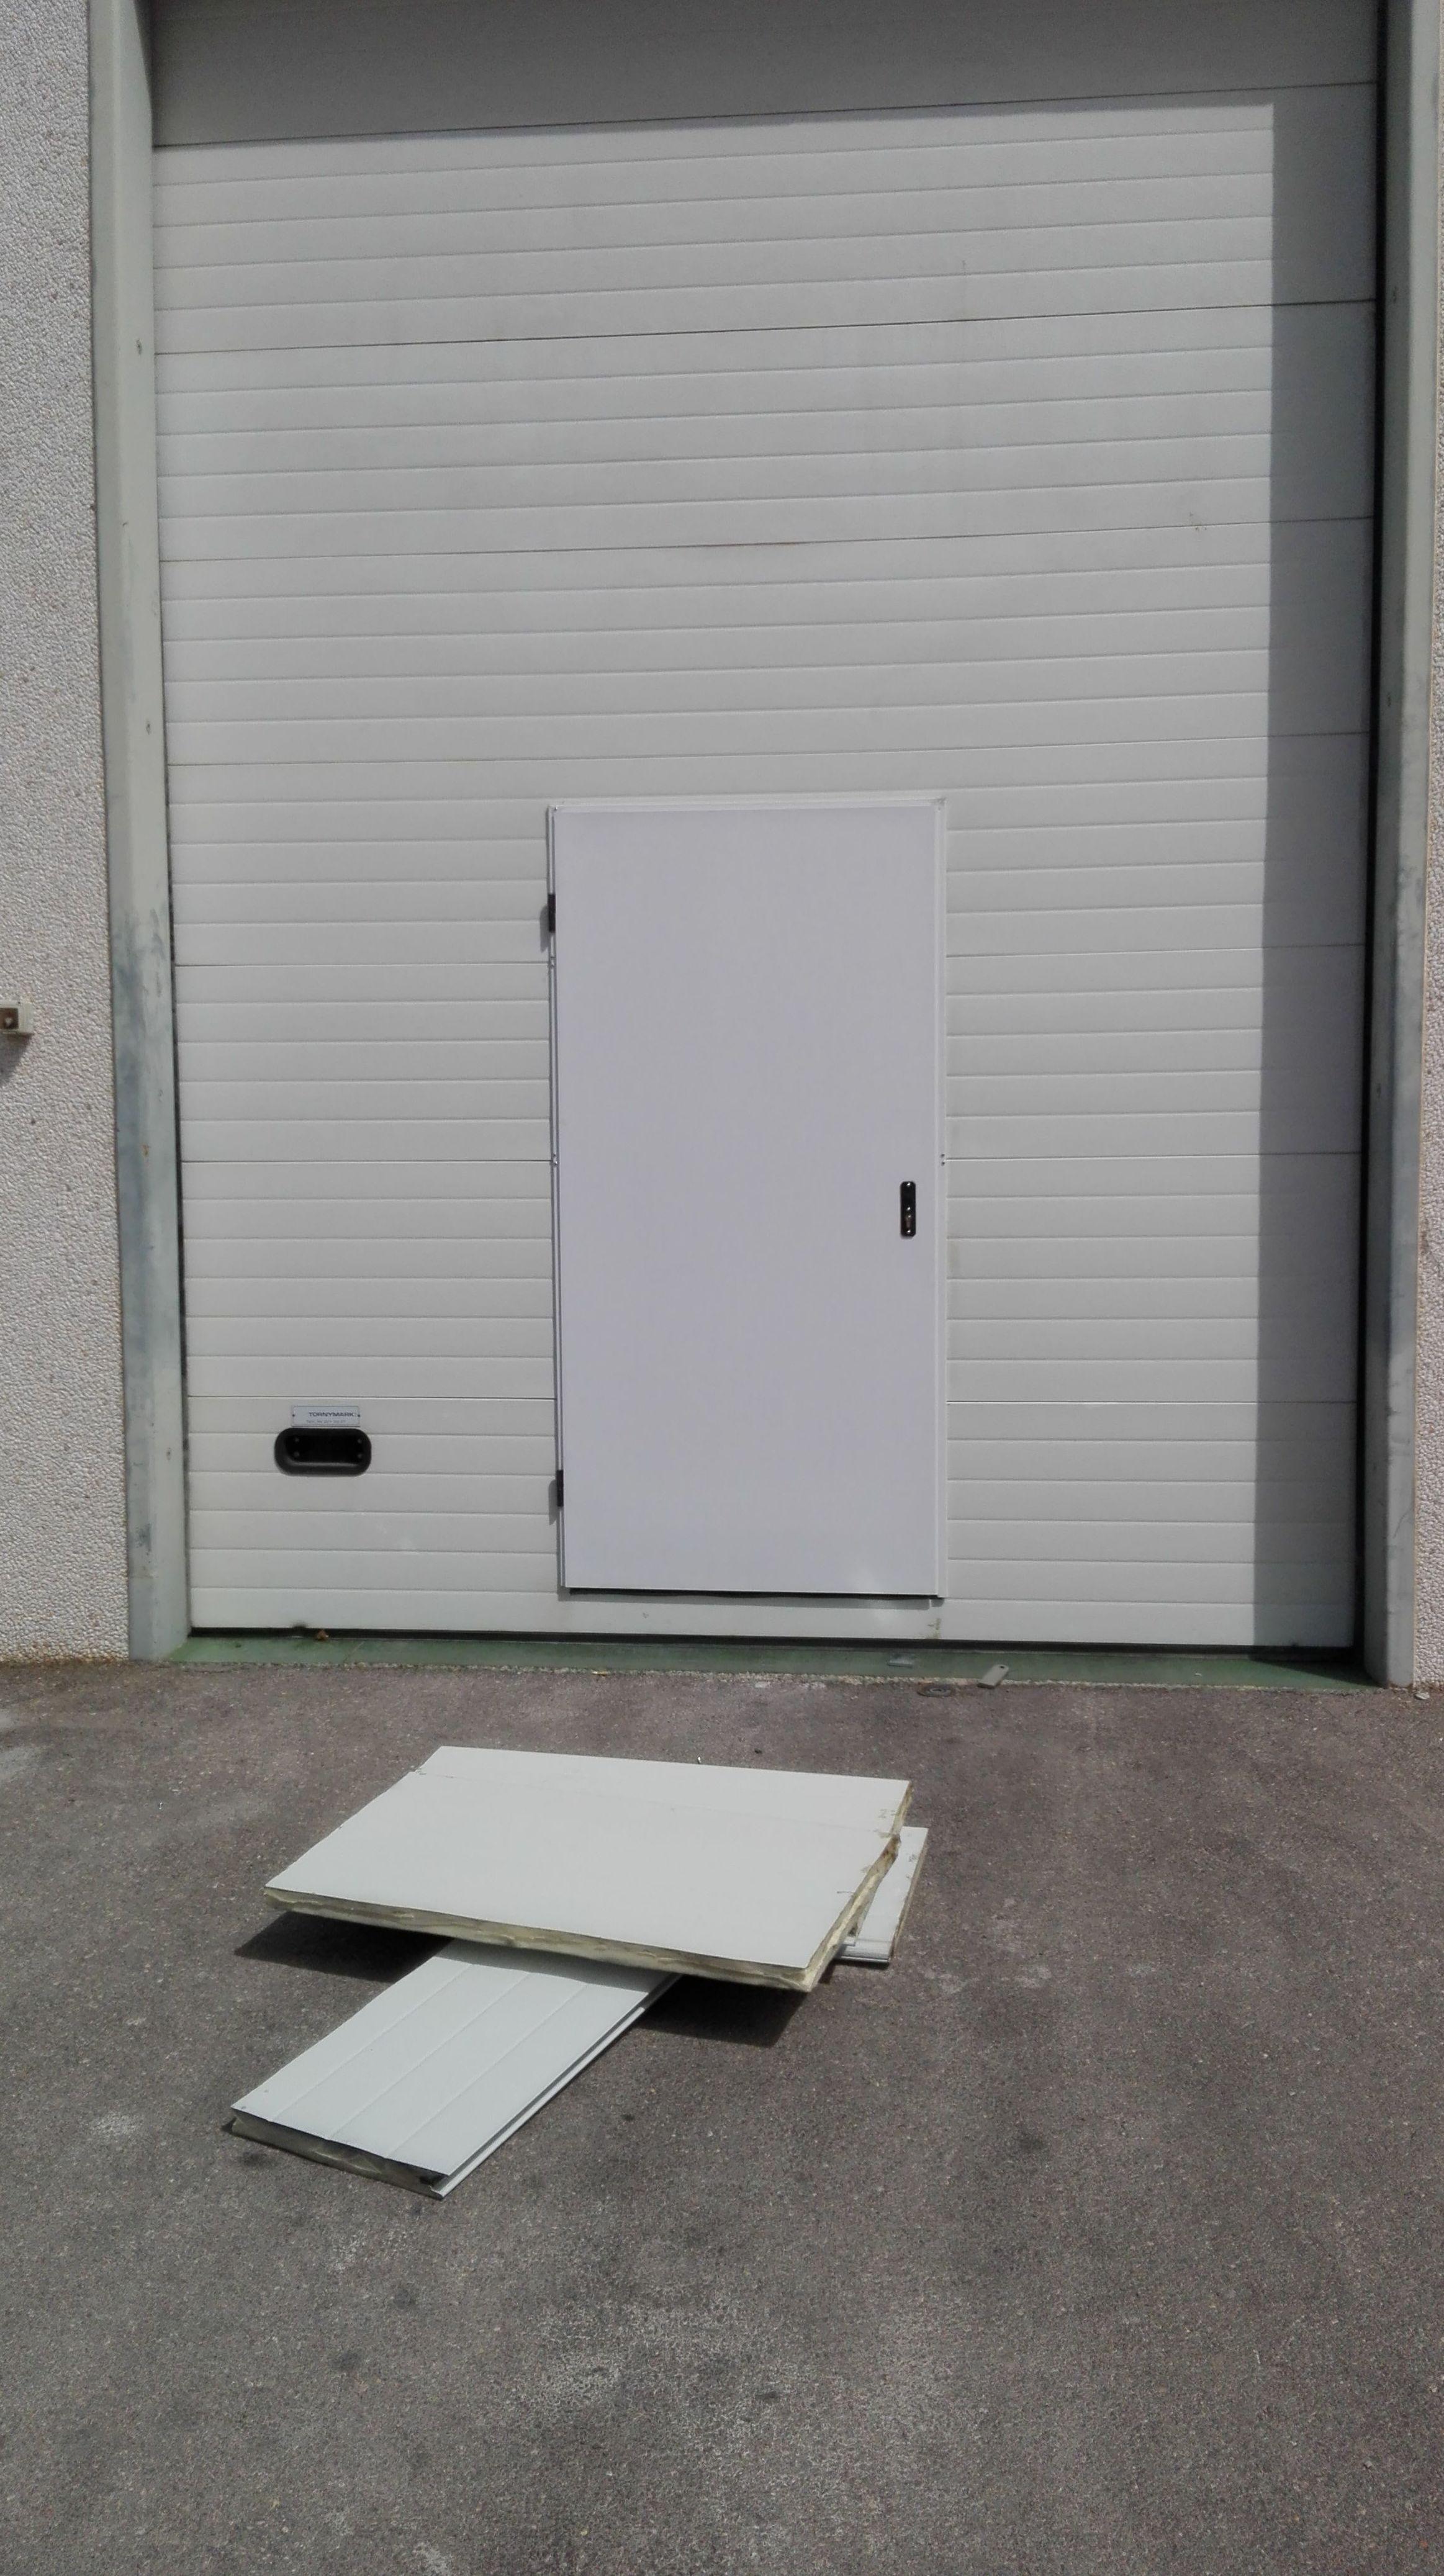 puerta peatonal incorporada en puerta seccional salida de emergencia